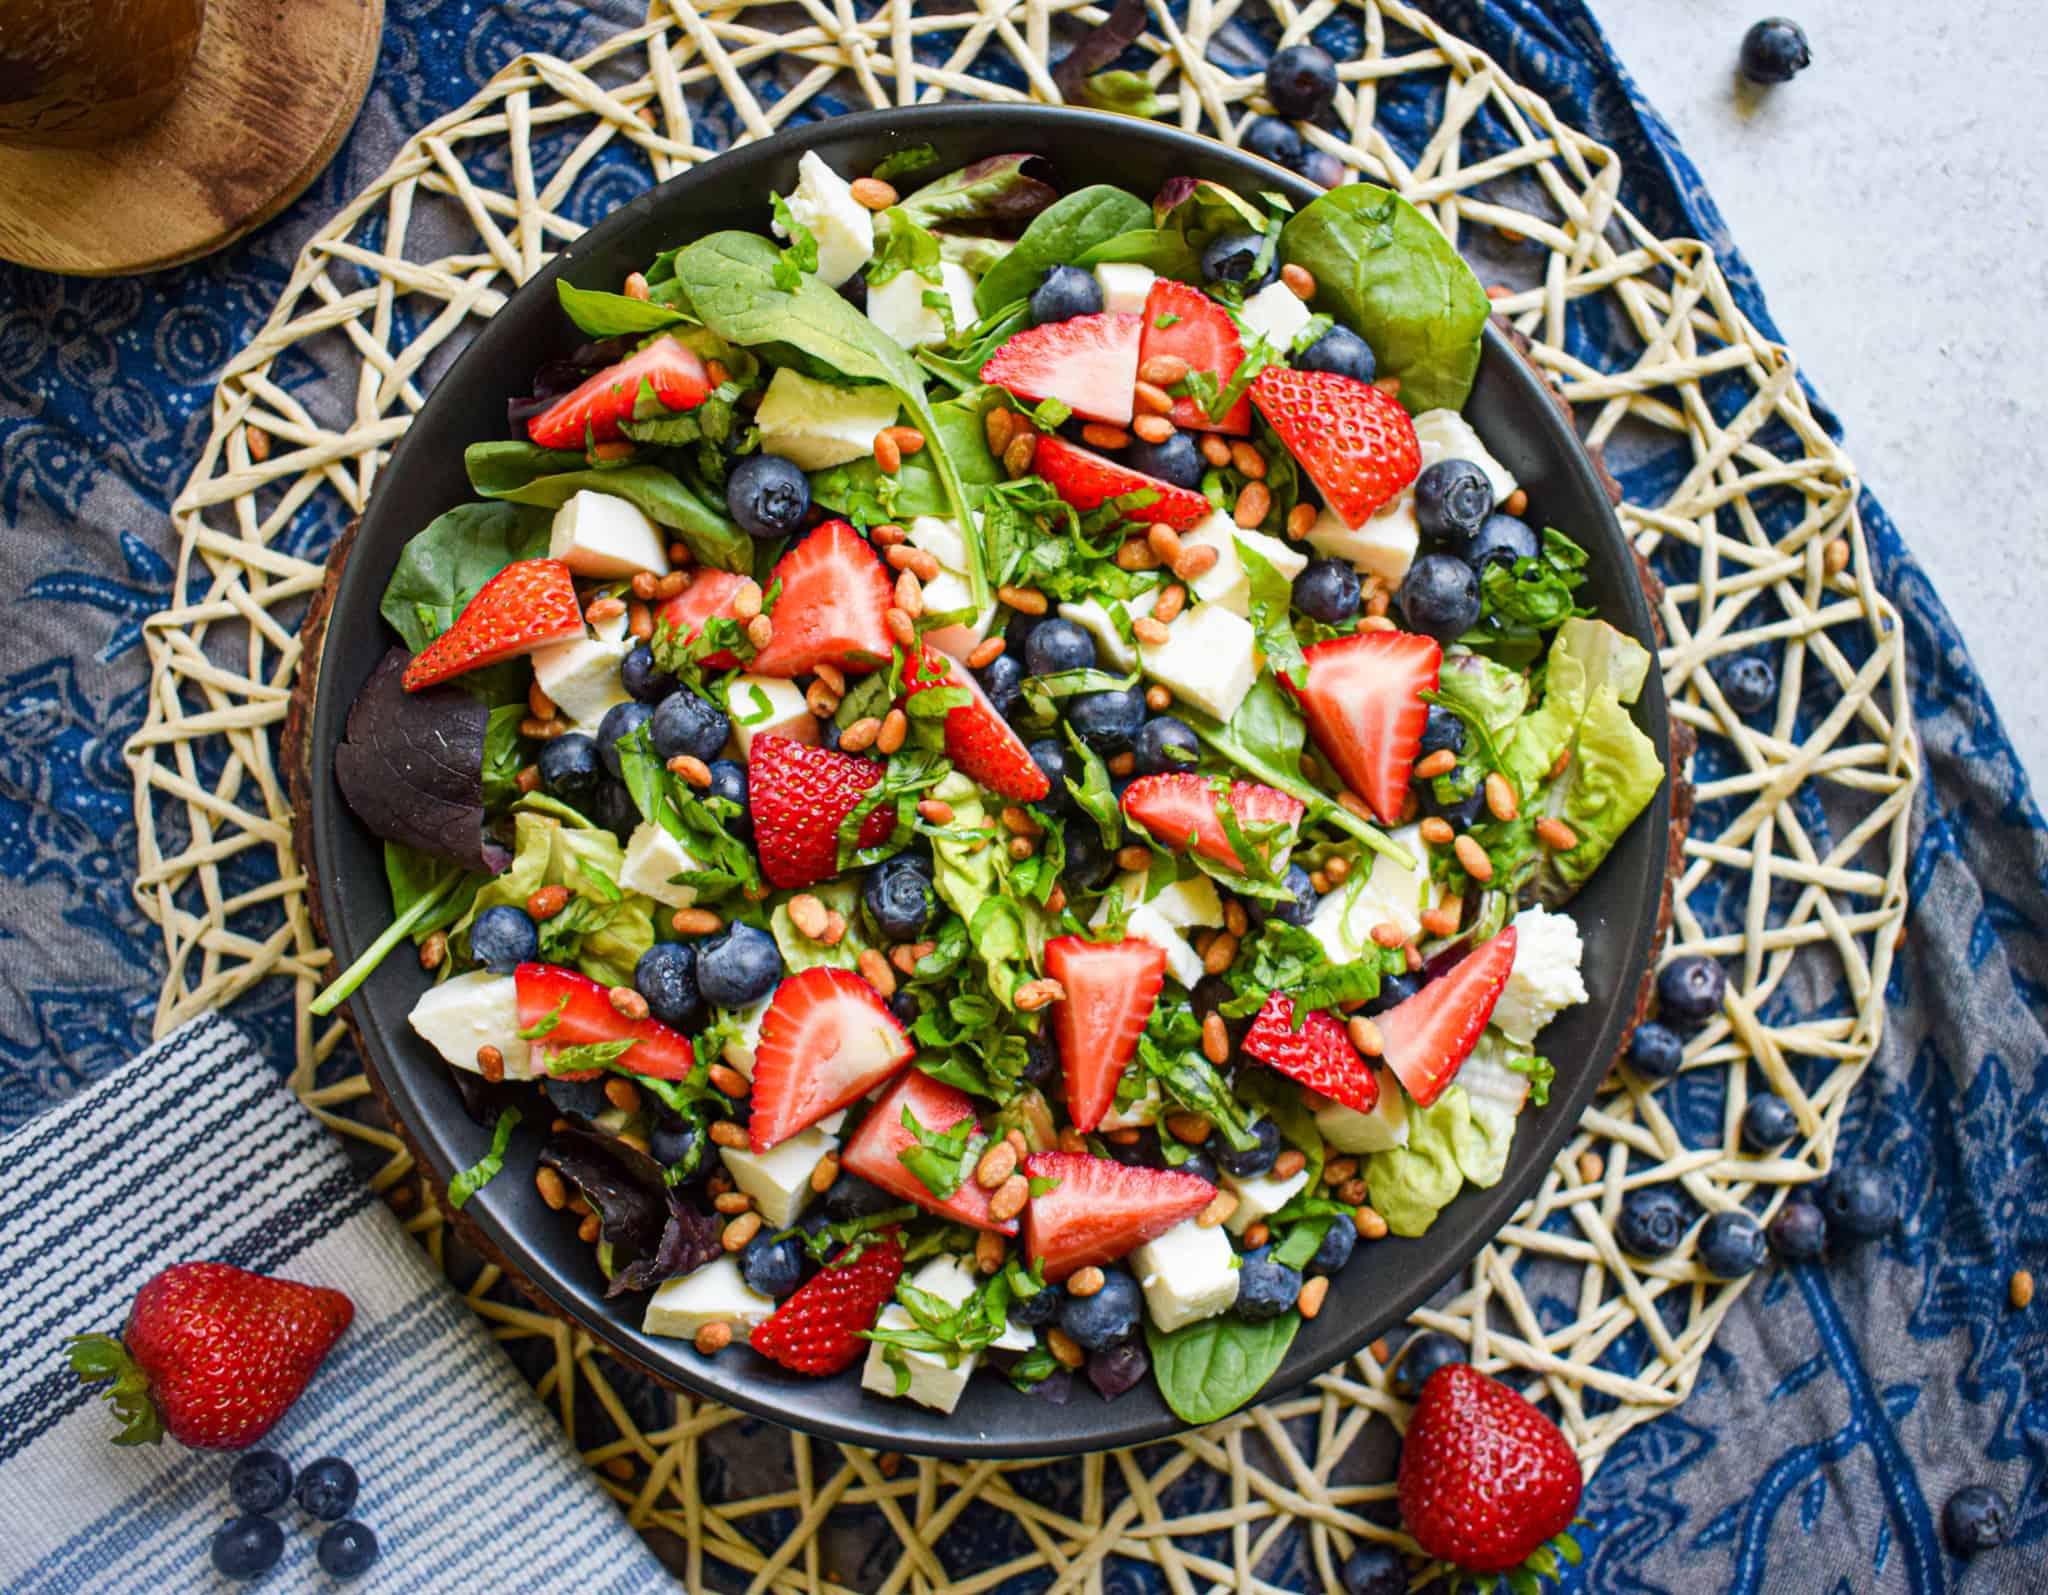 red white and blue patriotic salad recipe with mozzarella